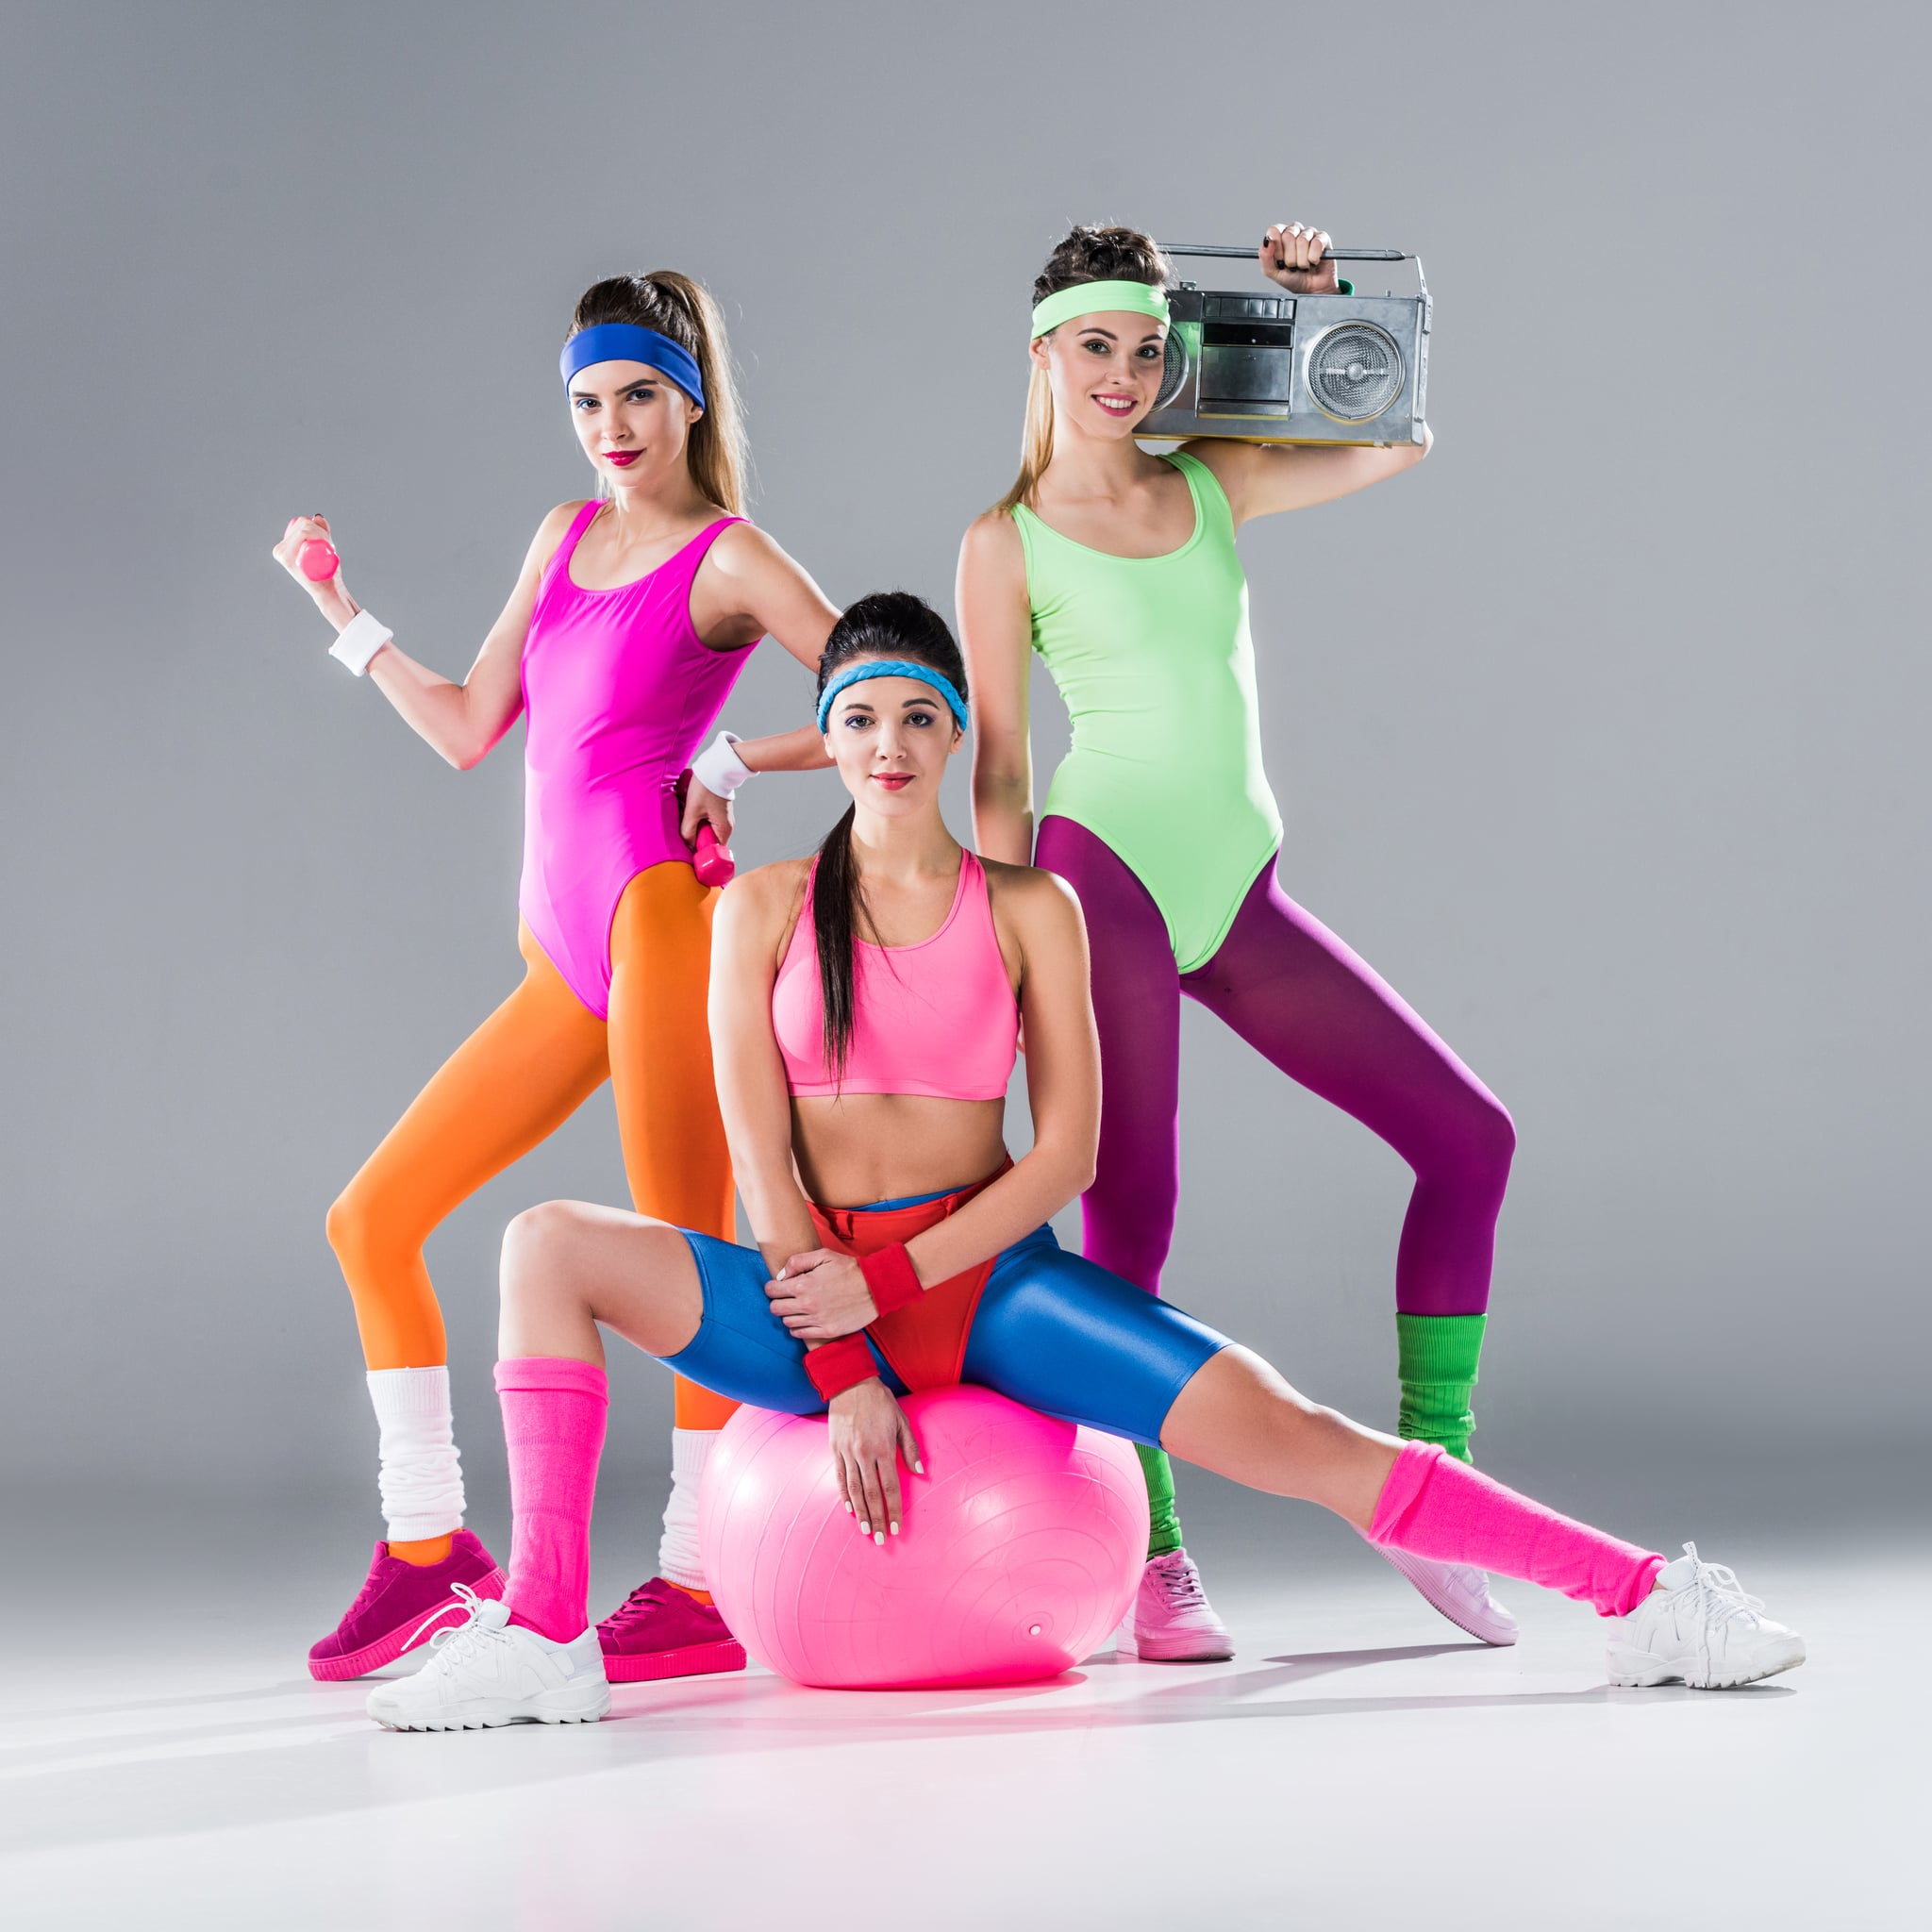 80s Exercise Fashion